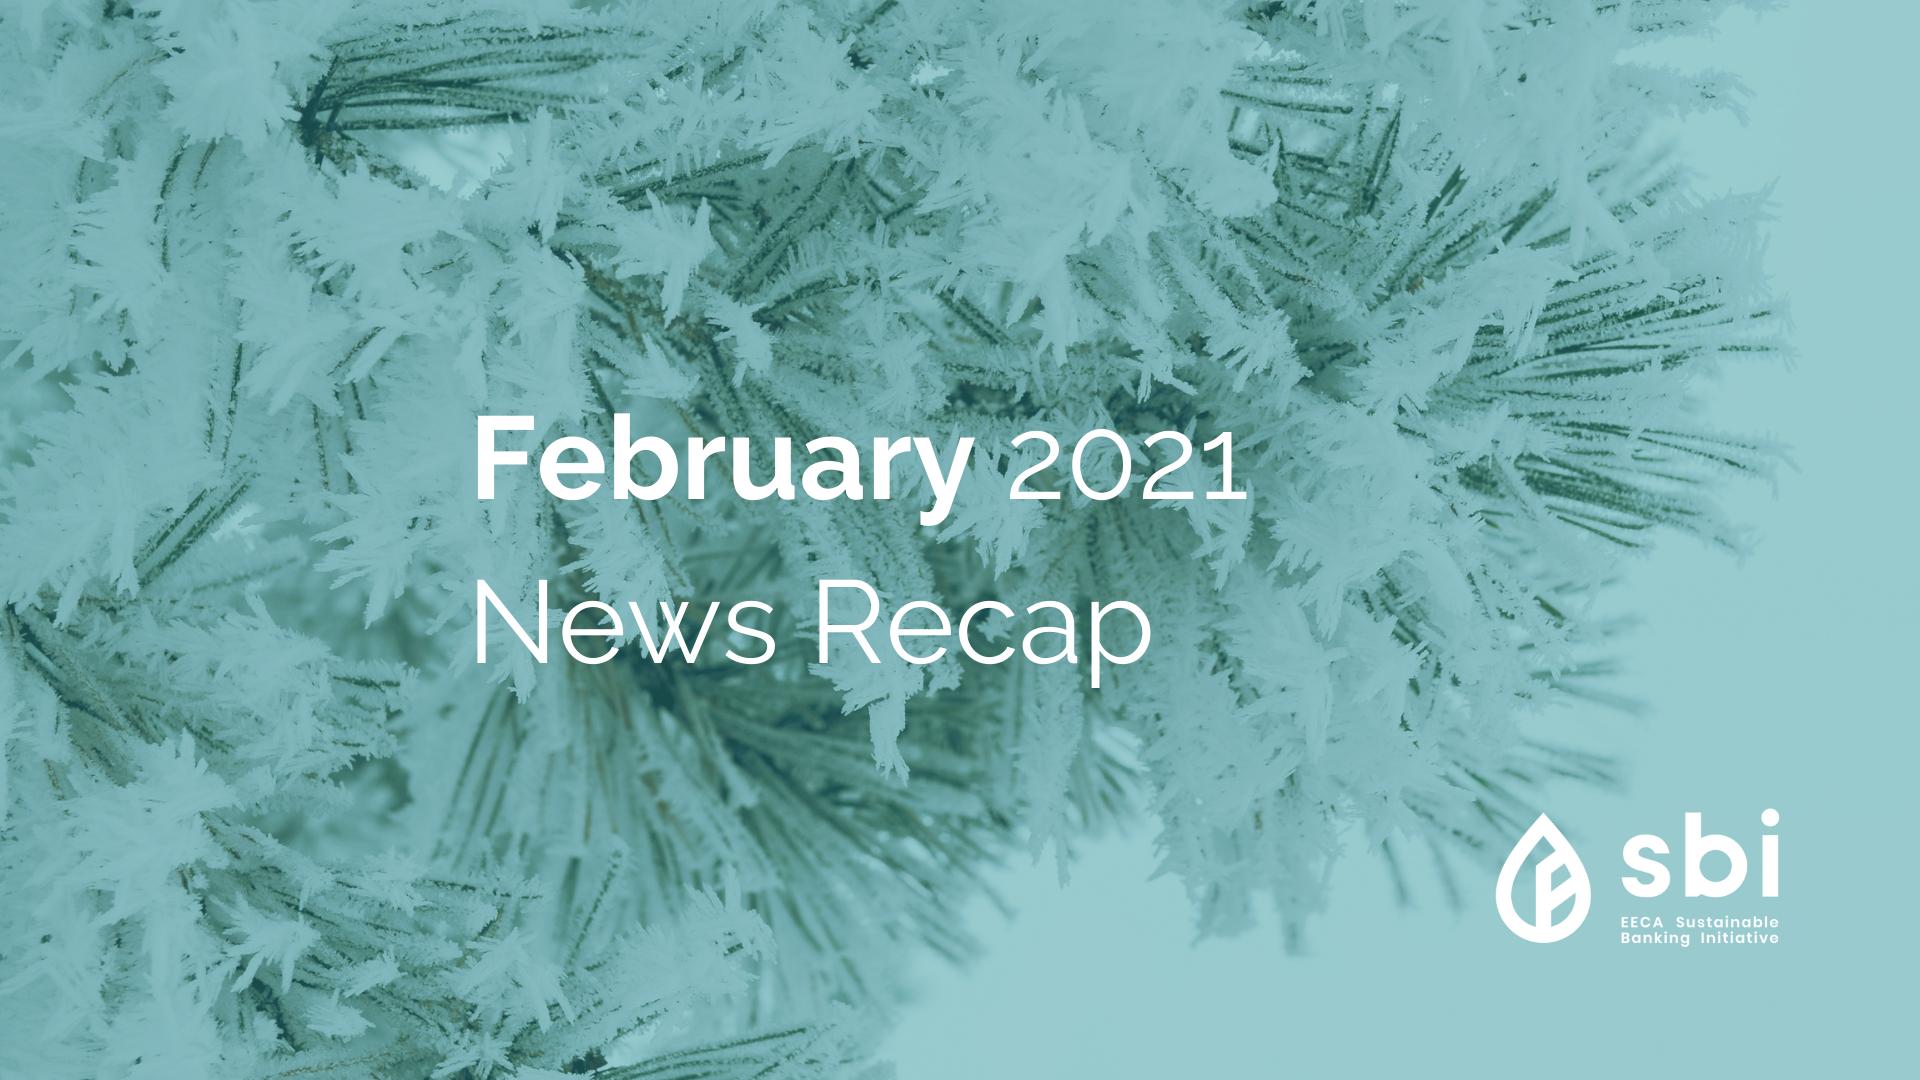 Feruary 2021 News Recap